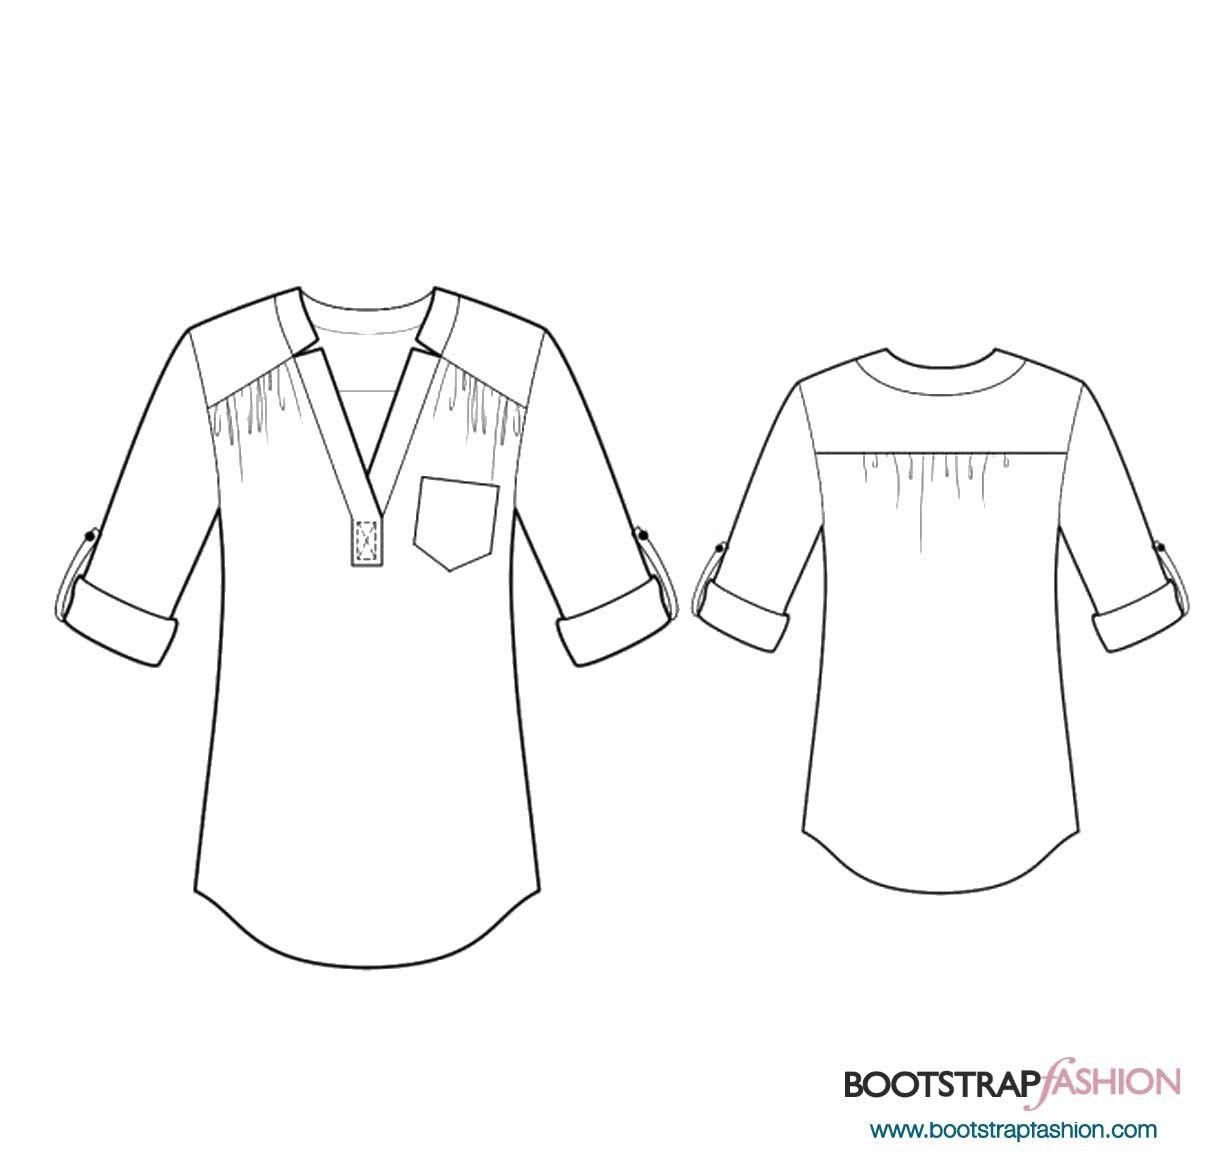 Bootstrapfashion designer sewing patterns free trend bootstrapfashion designer sewing patterns free trend reports and fashion jeuxipadfo Images